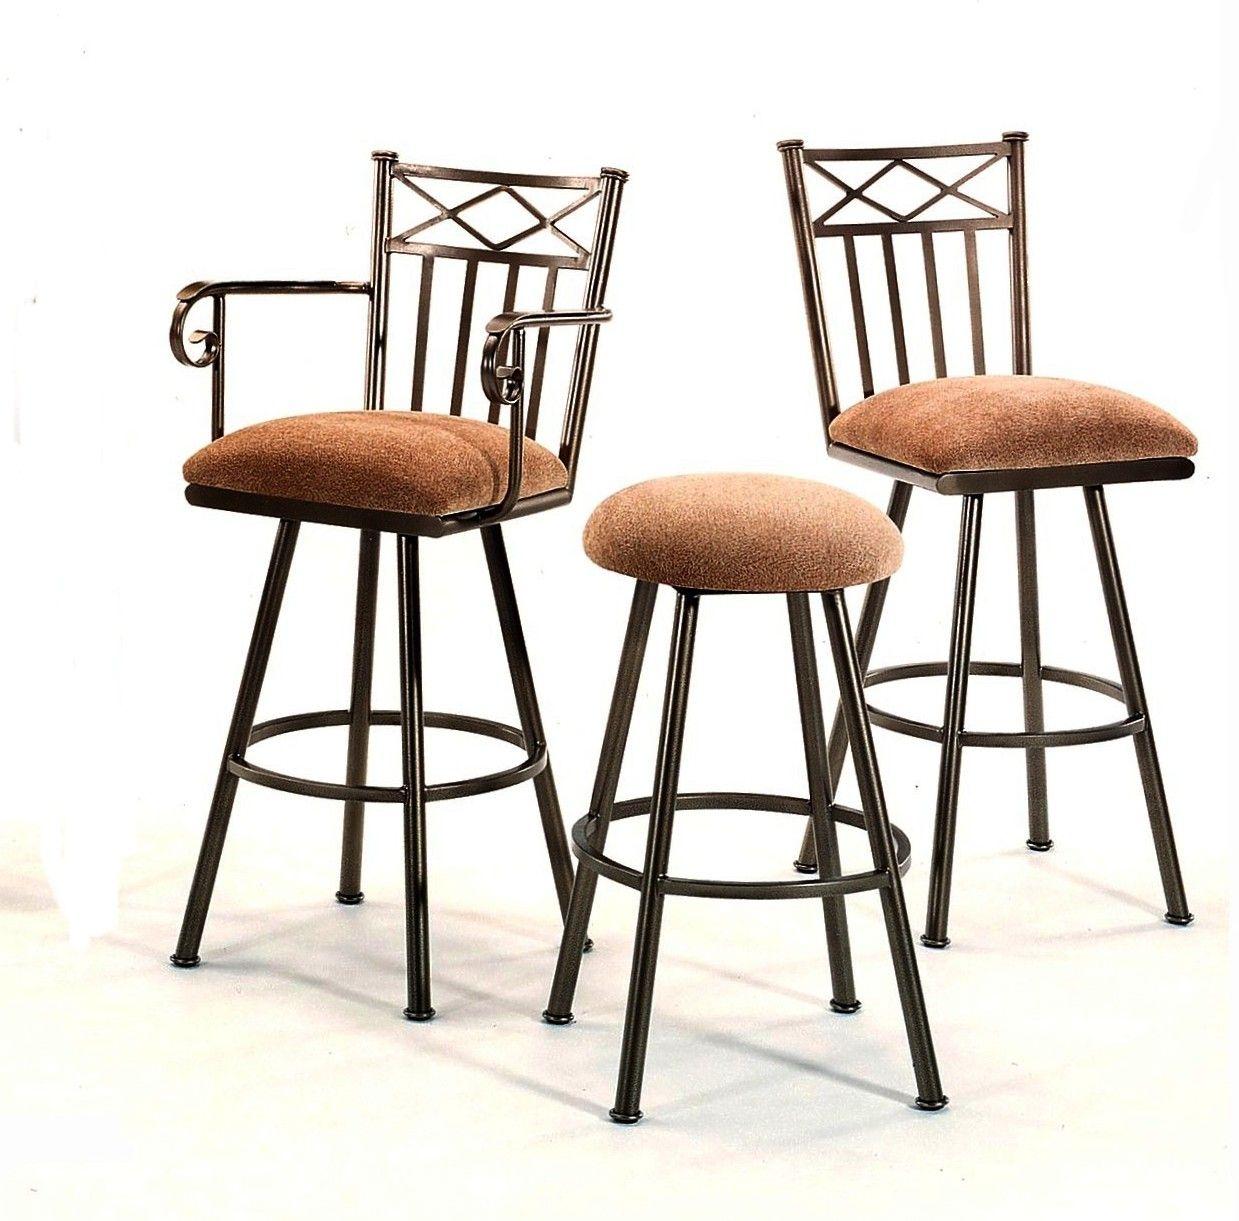 Metal Barstools A C Billiards Barstools Bar Stools Metal Bar Stools Game Room Furniture